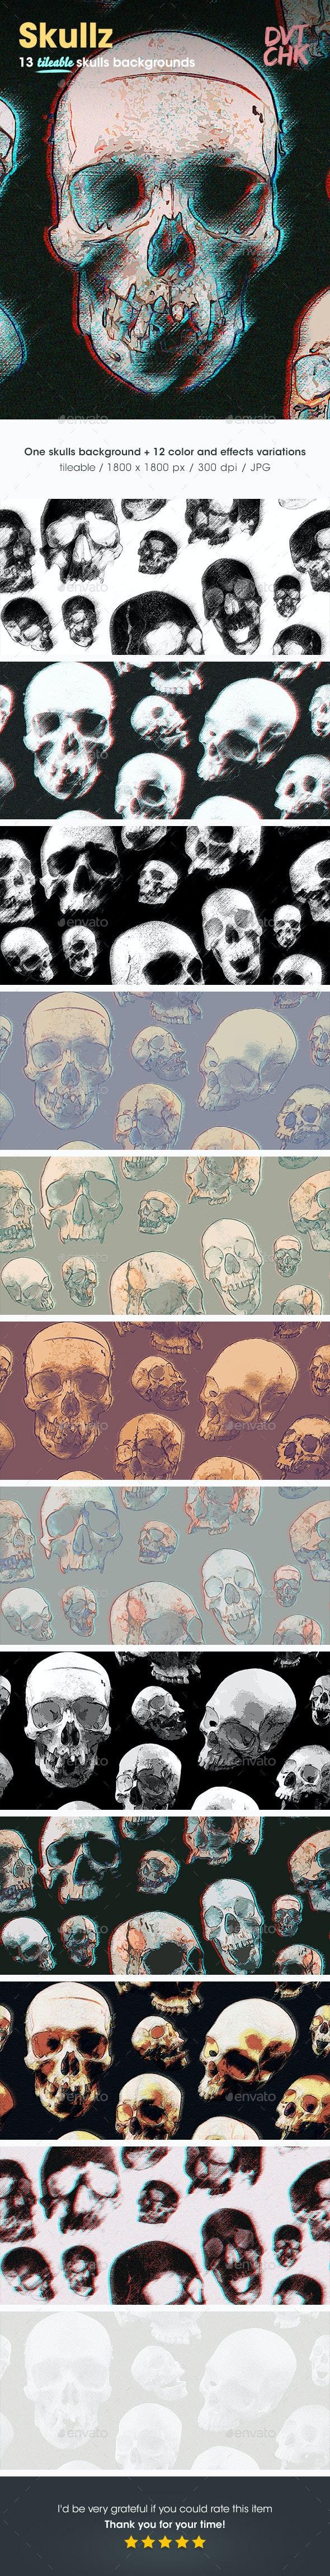 Skullz Backgrounds - Patterns Backgrounds